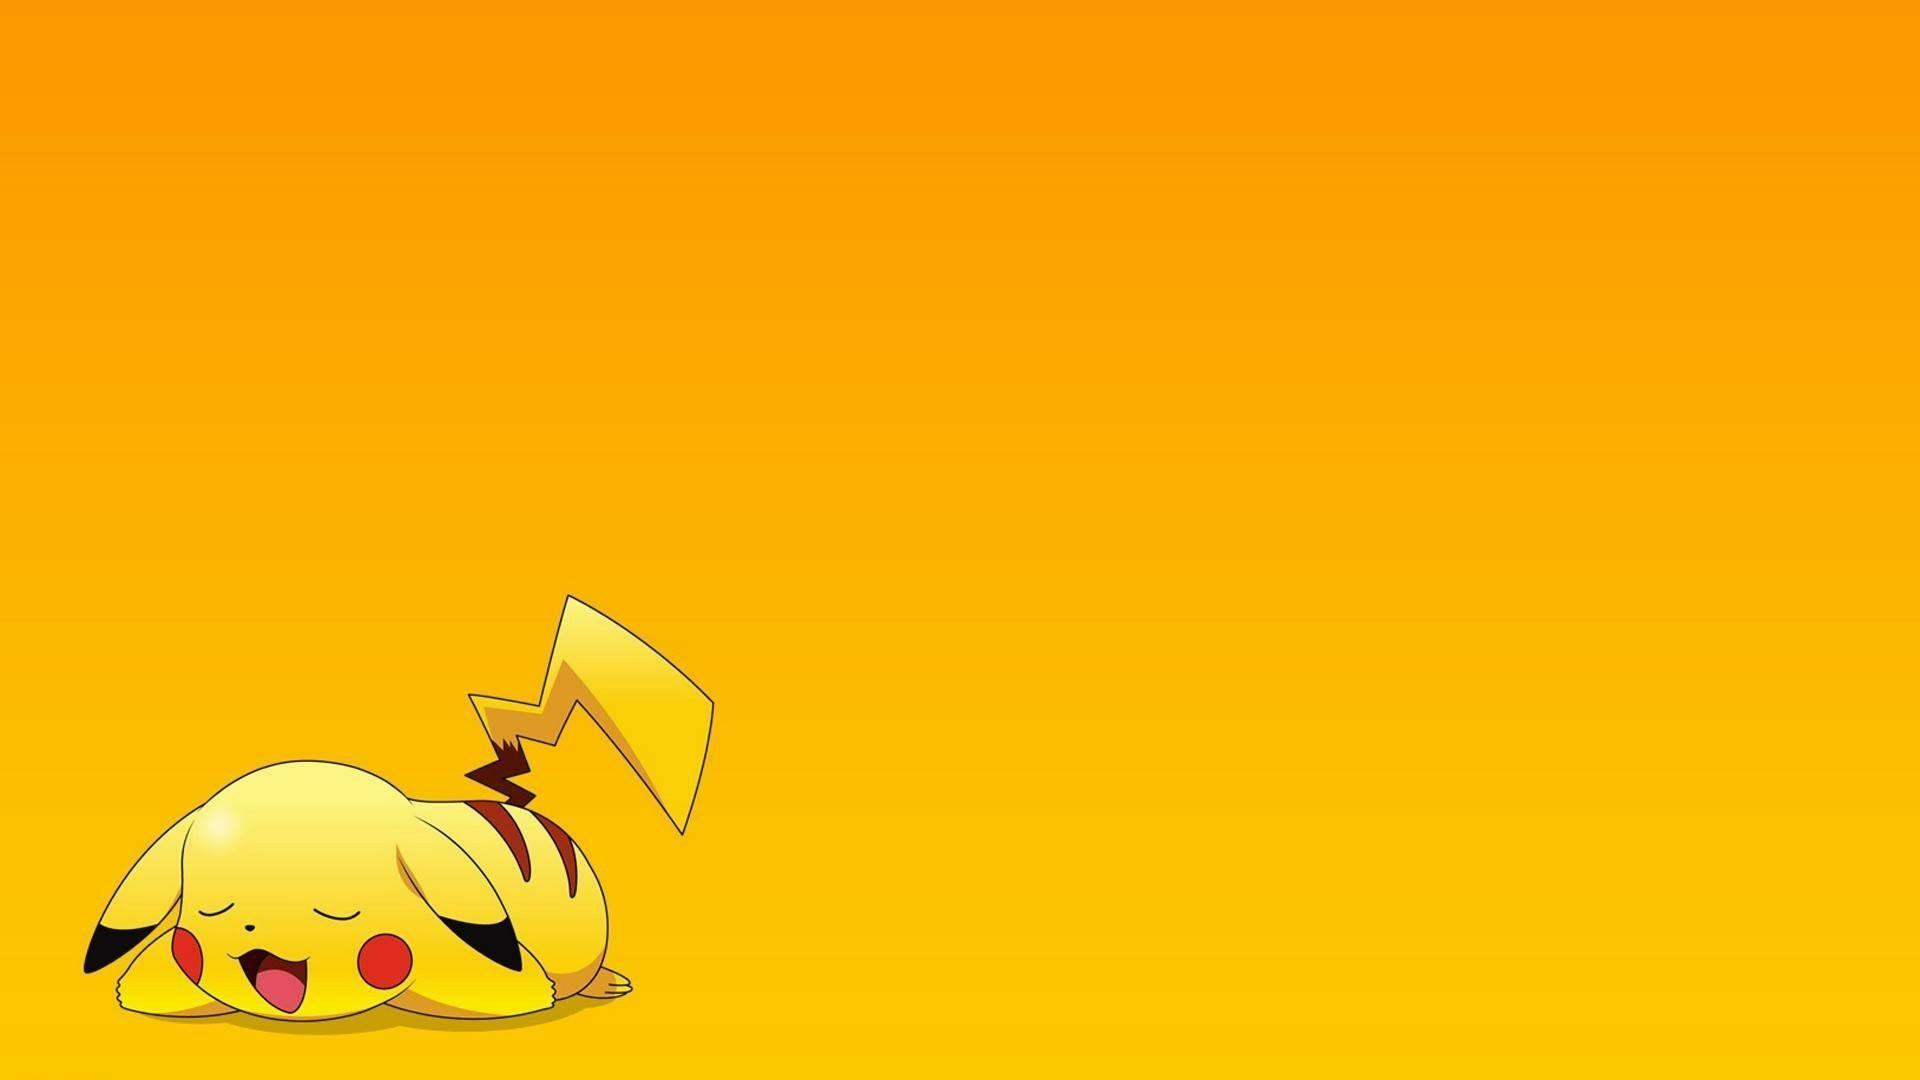 pikachu-image-Full-HD-Backgrounds-1920-x-1080-